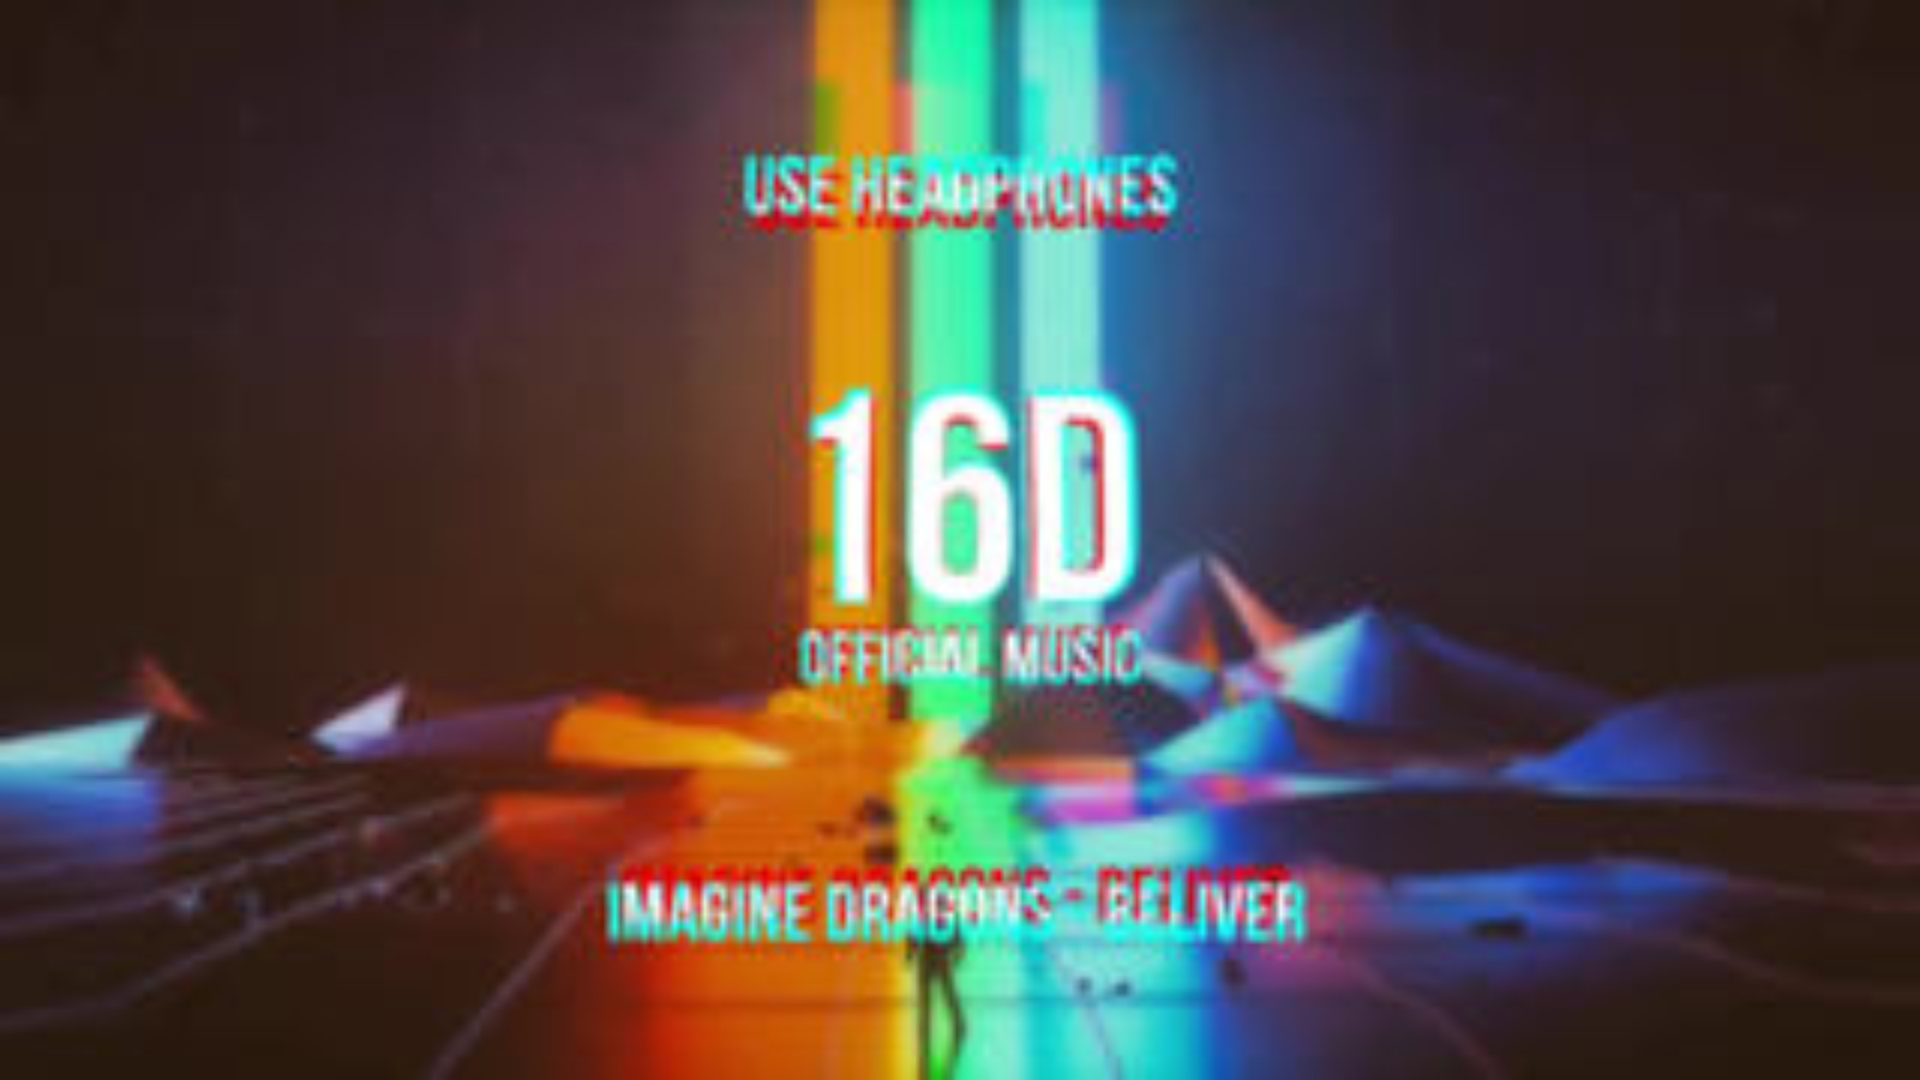 16D版《Believer-Imagine Dragons》,感觉音响就在你的耳边环绕着!